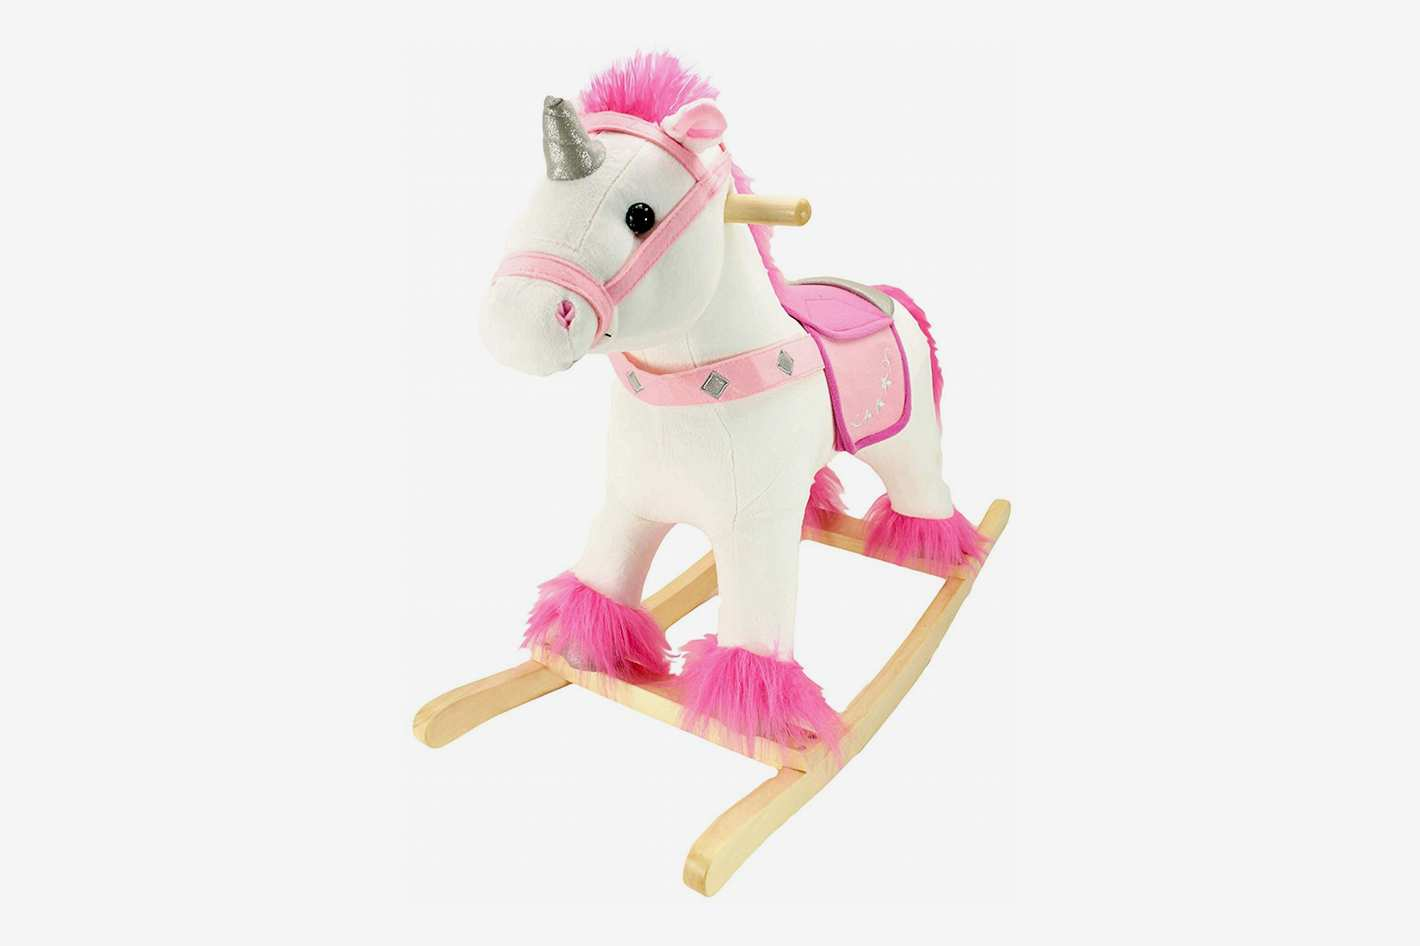 Animal Adventure Unicorn Real Wood Ride-On Plush Rocker